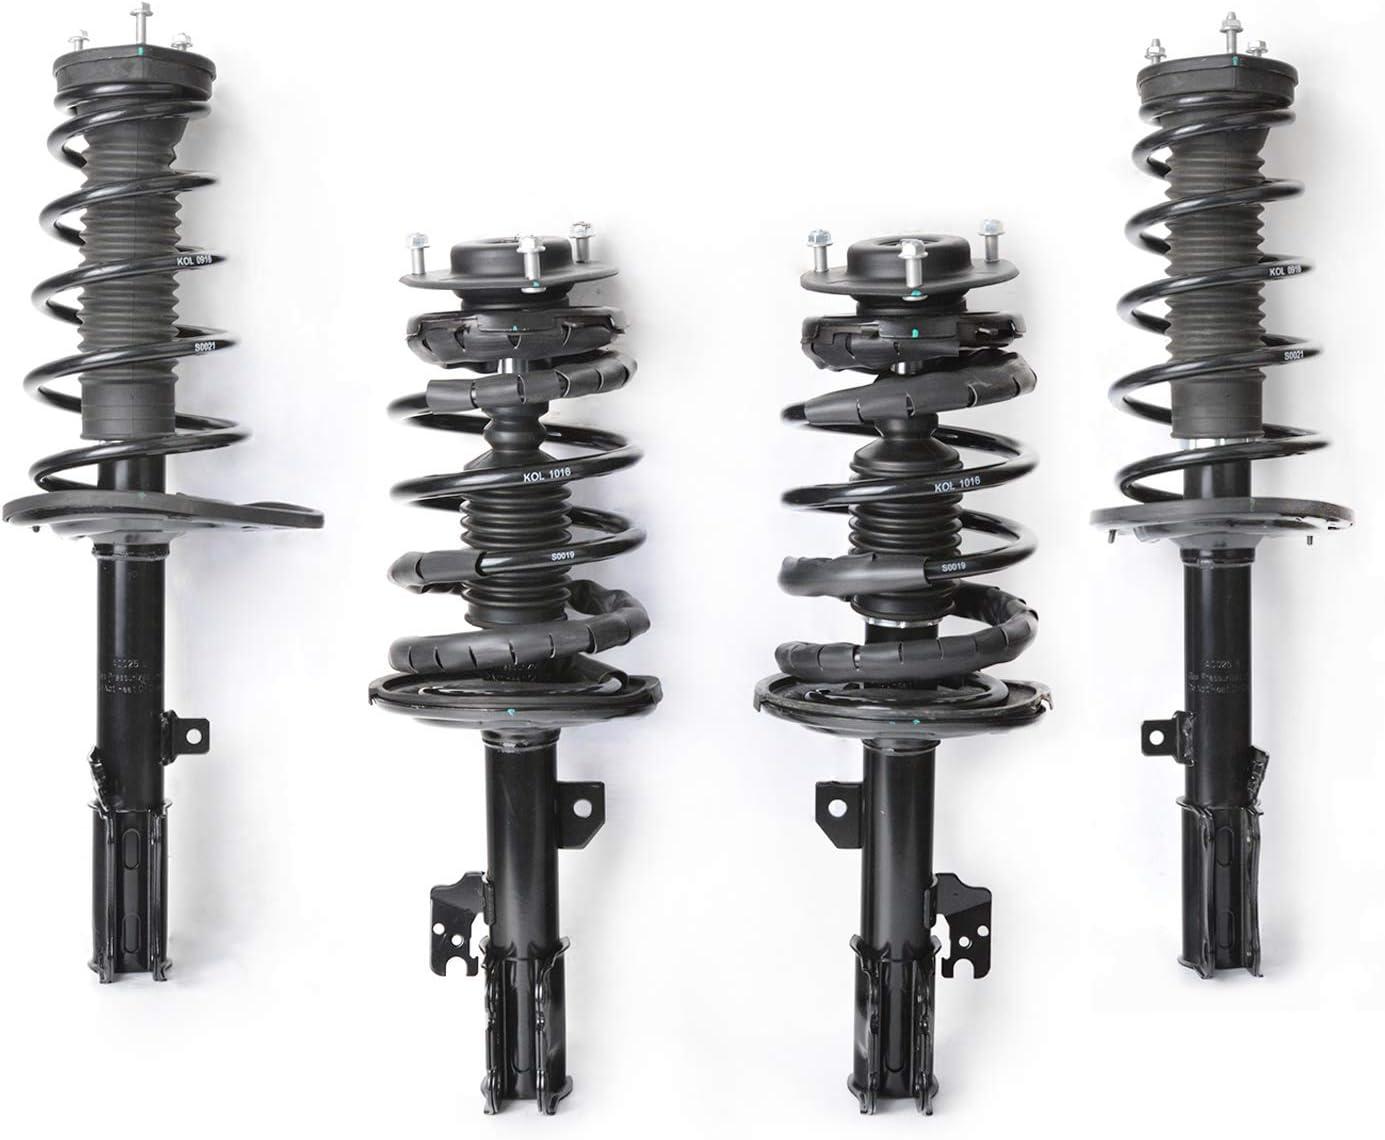 4 New DTA Shocks /& Struts Full Set OE Repl with Ltd Lifetime Warranty Camry